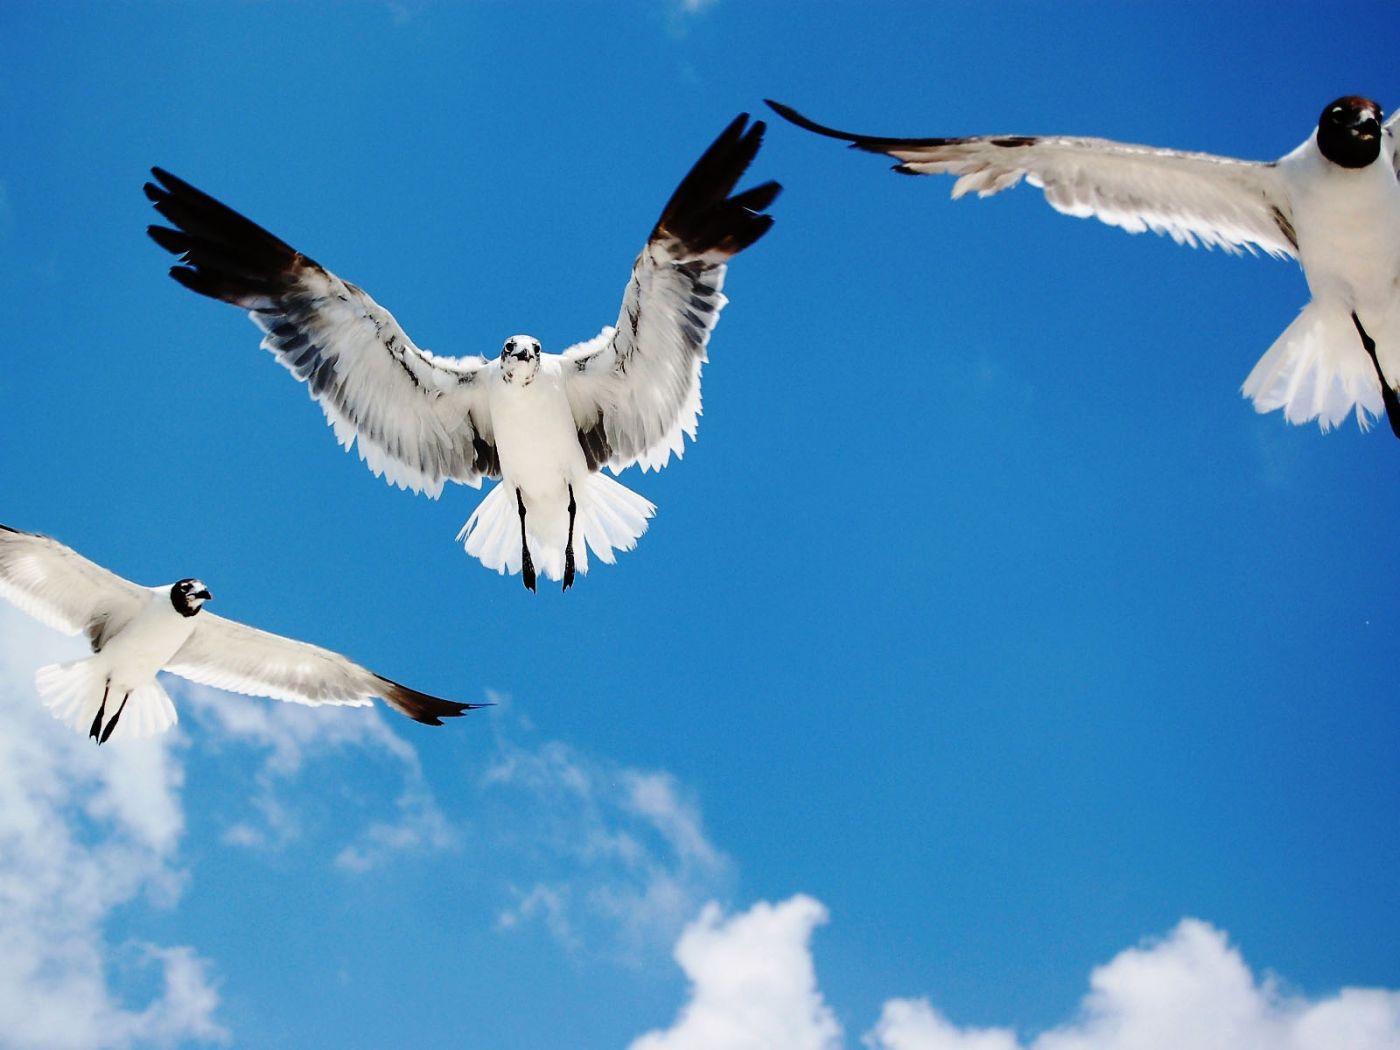 Birds Flying In The Sky Wallpaper 1400x1050